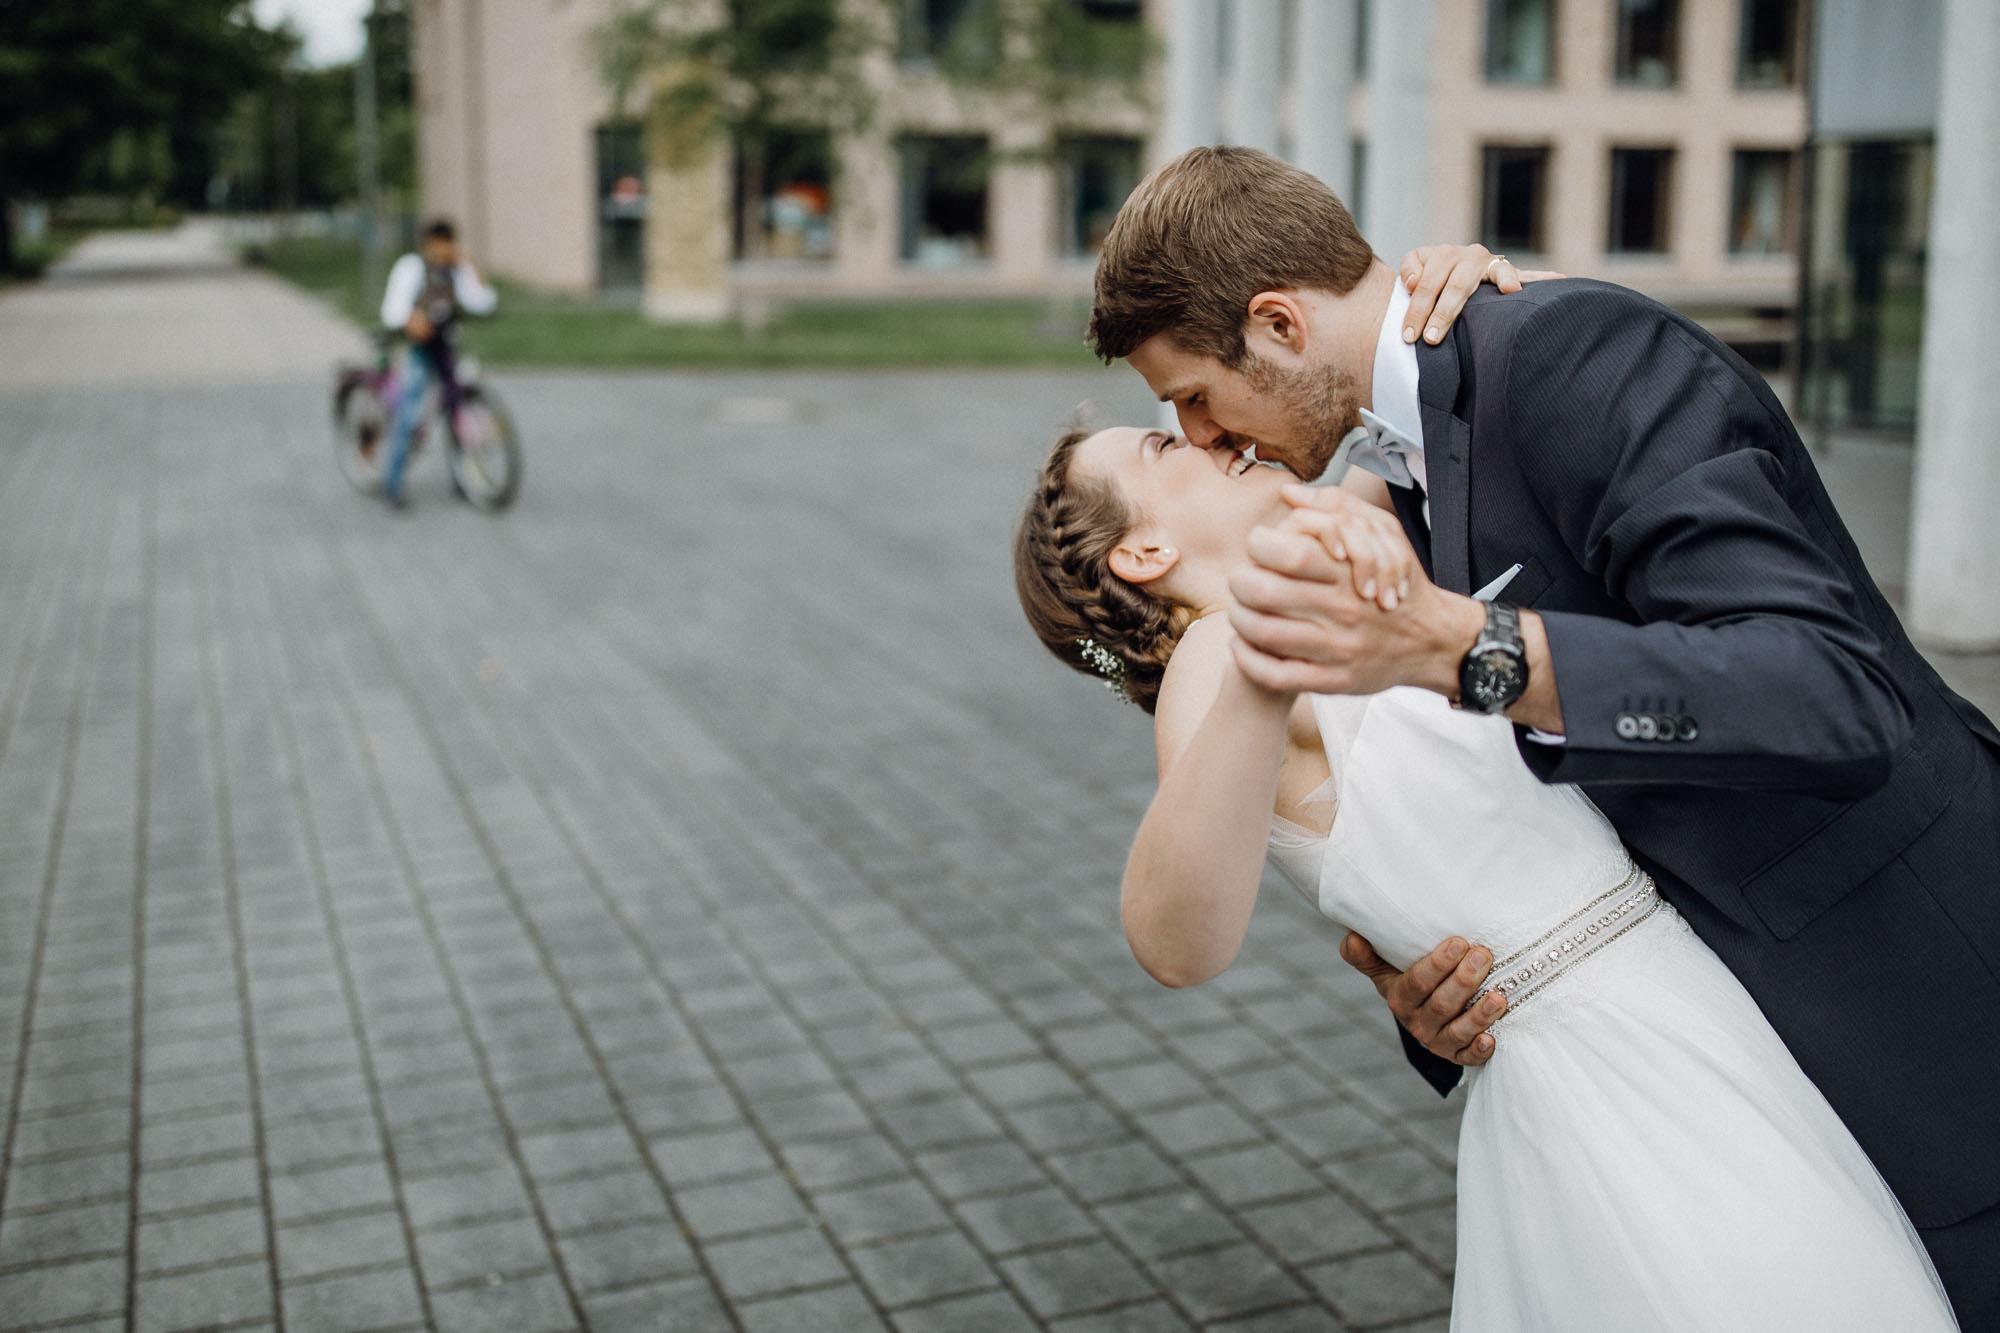 raissa simon photography destination wedding munich black forest offenburg 049 - Claudia + Christoph